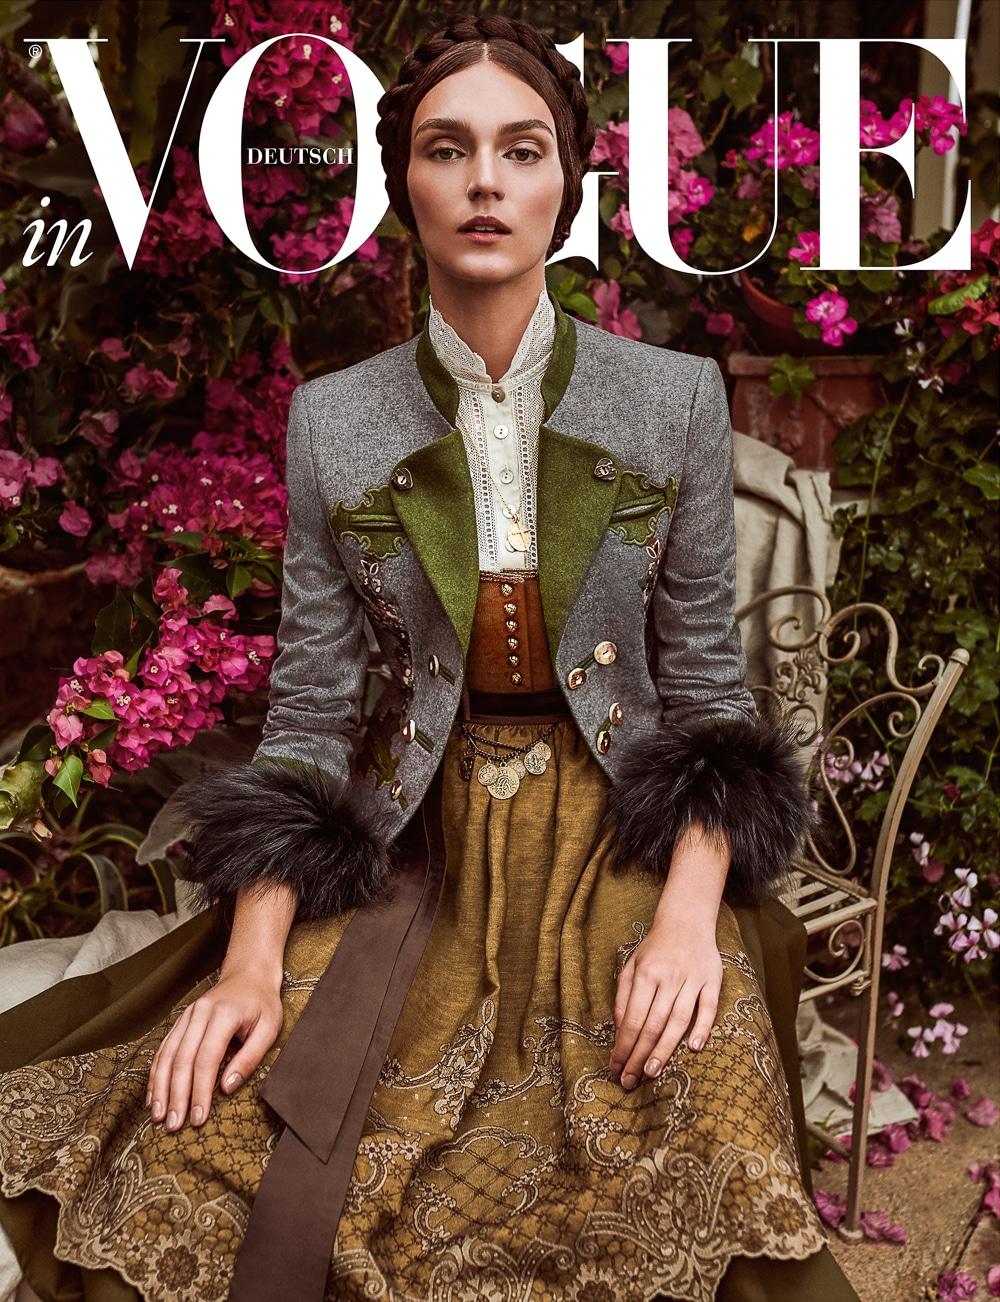 Vogue-Germany-August-2018-Deimante-Misiunaite-Andreas-Ortner-4.jpg